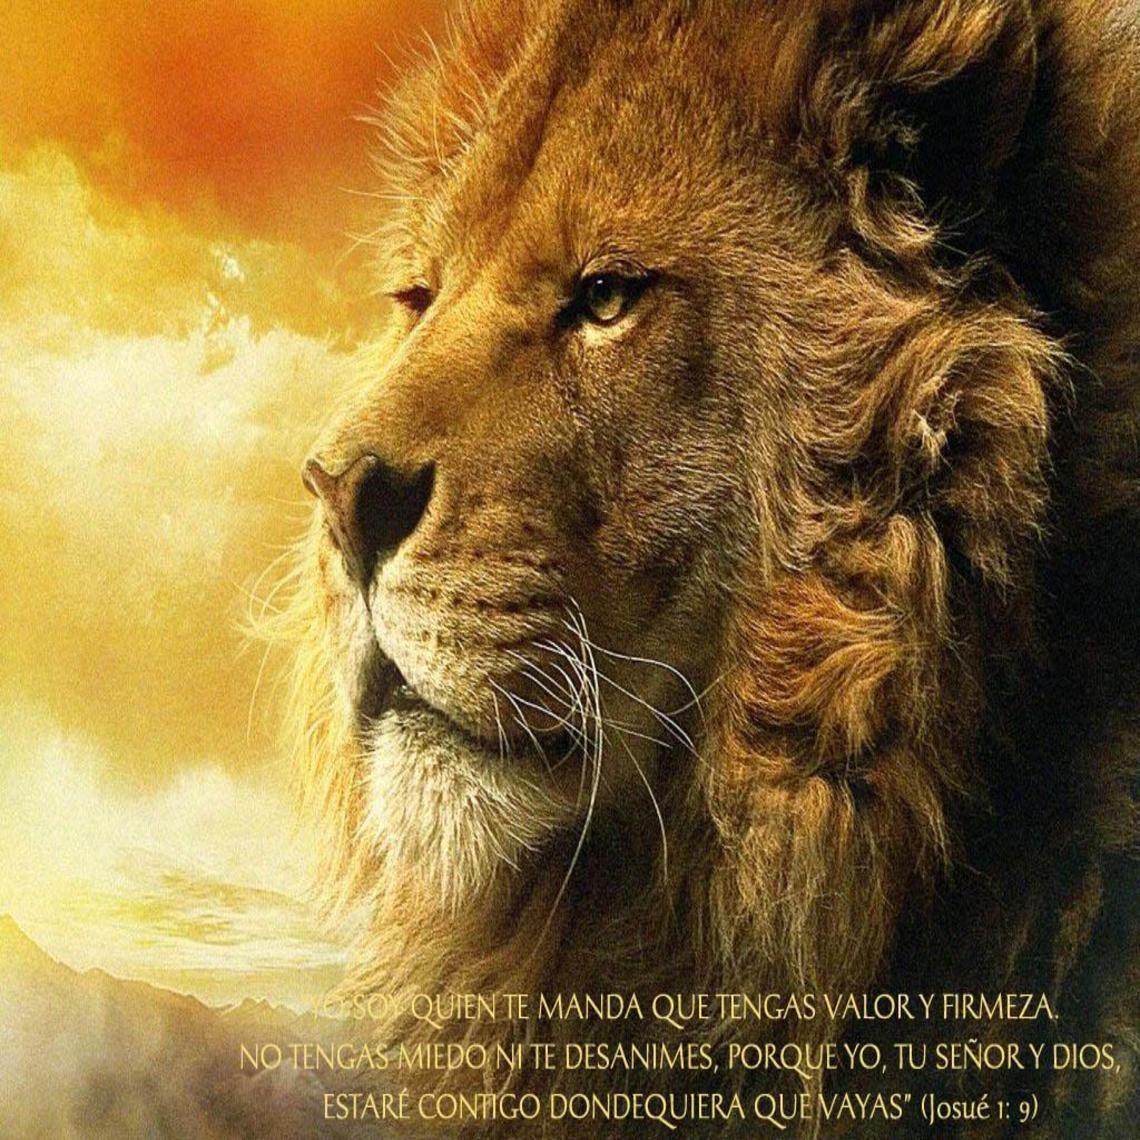 Aslan, The Chronicles of Narnia